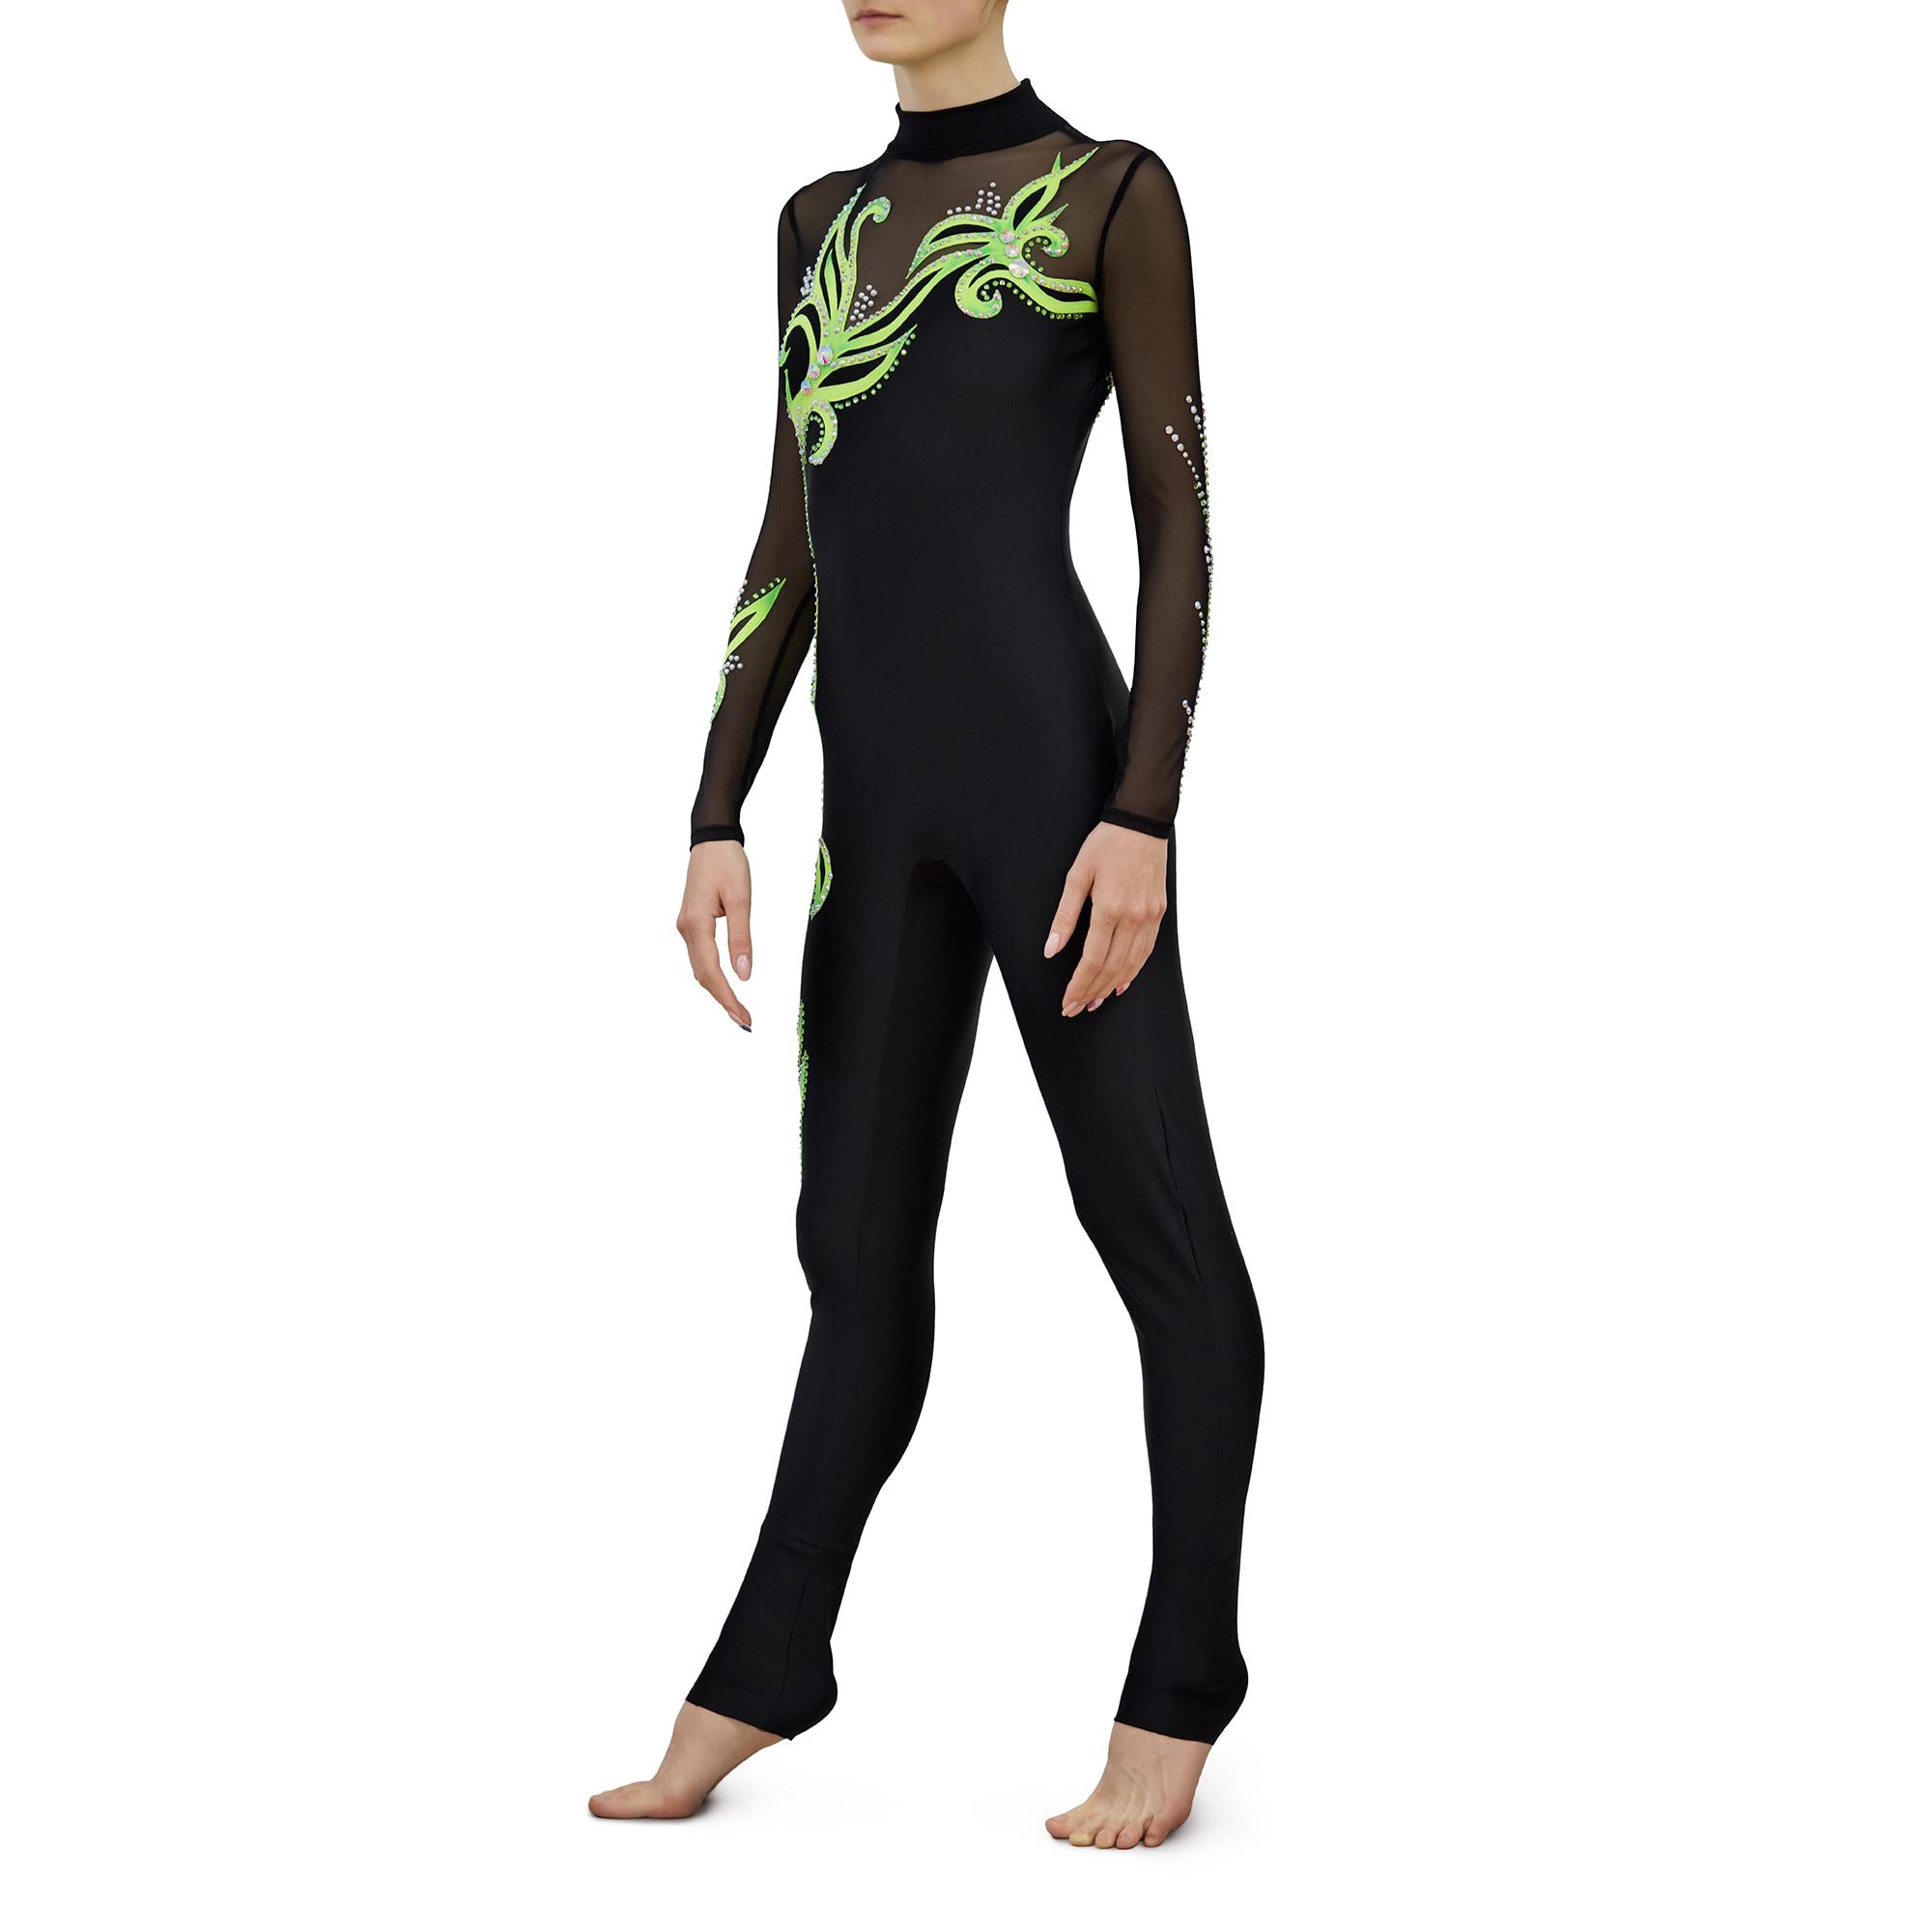 Black, lemon, black mesh Acrobatic Gymnastics Jumpsuit 243 with two sleeves & collar